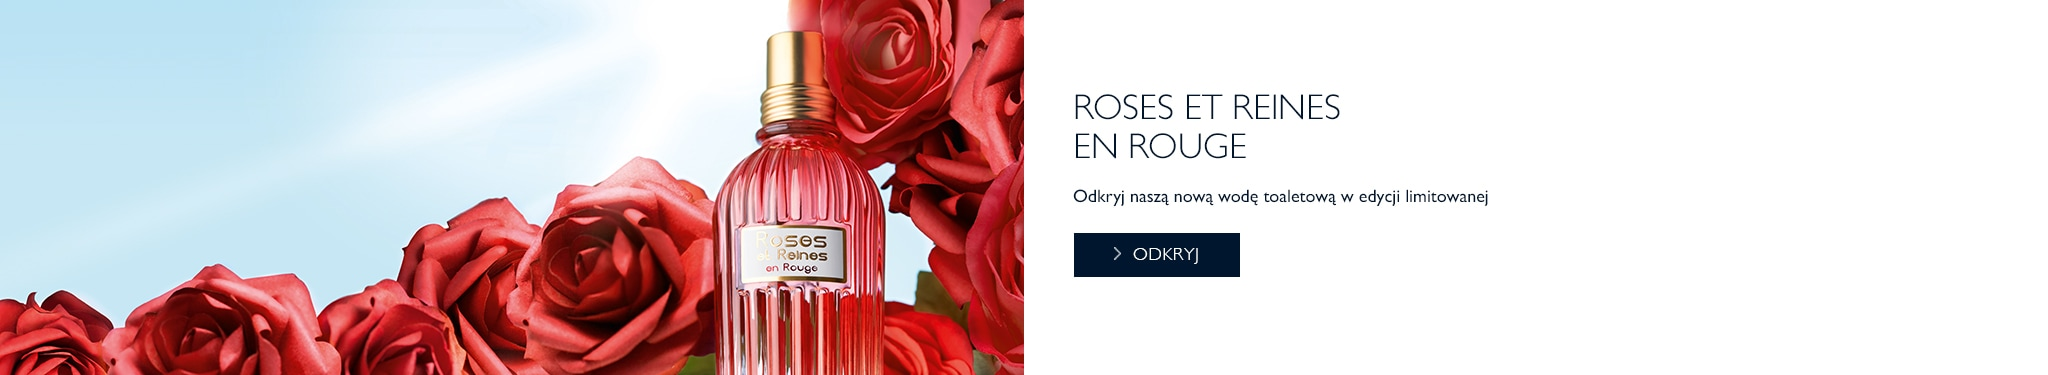 Roses et Reines en Rouge